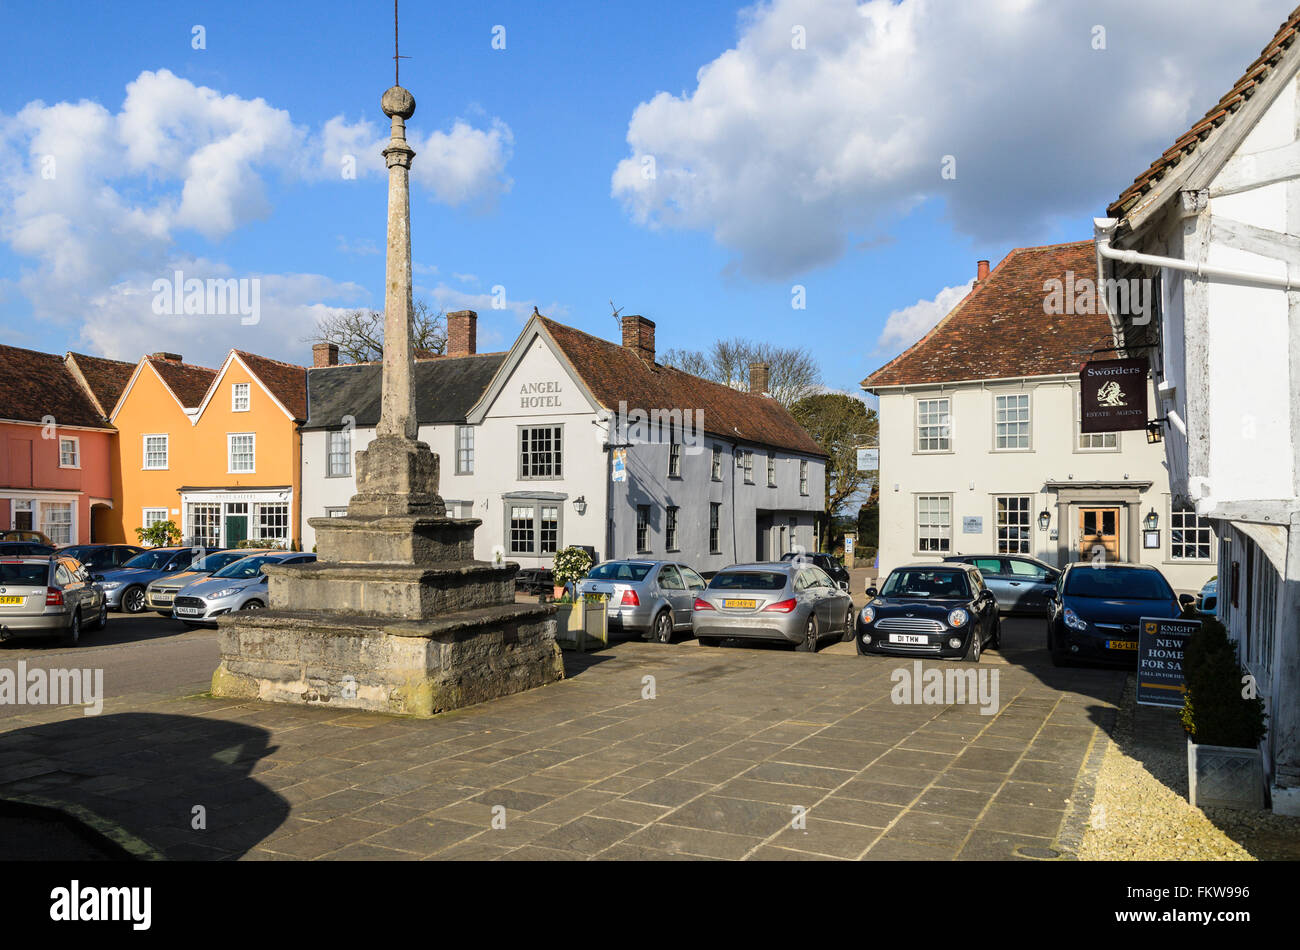 The historic Market Place, Lavenham, Suffolk, England, United Kingdom. Stock Photo